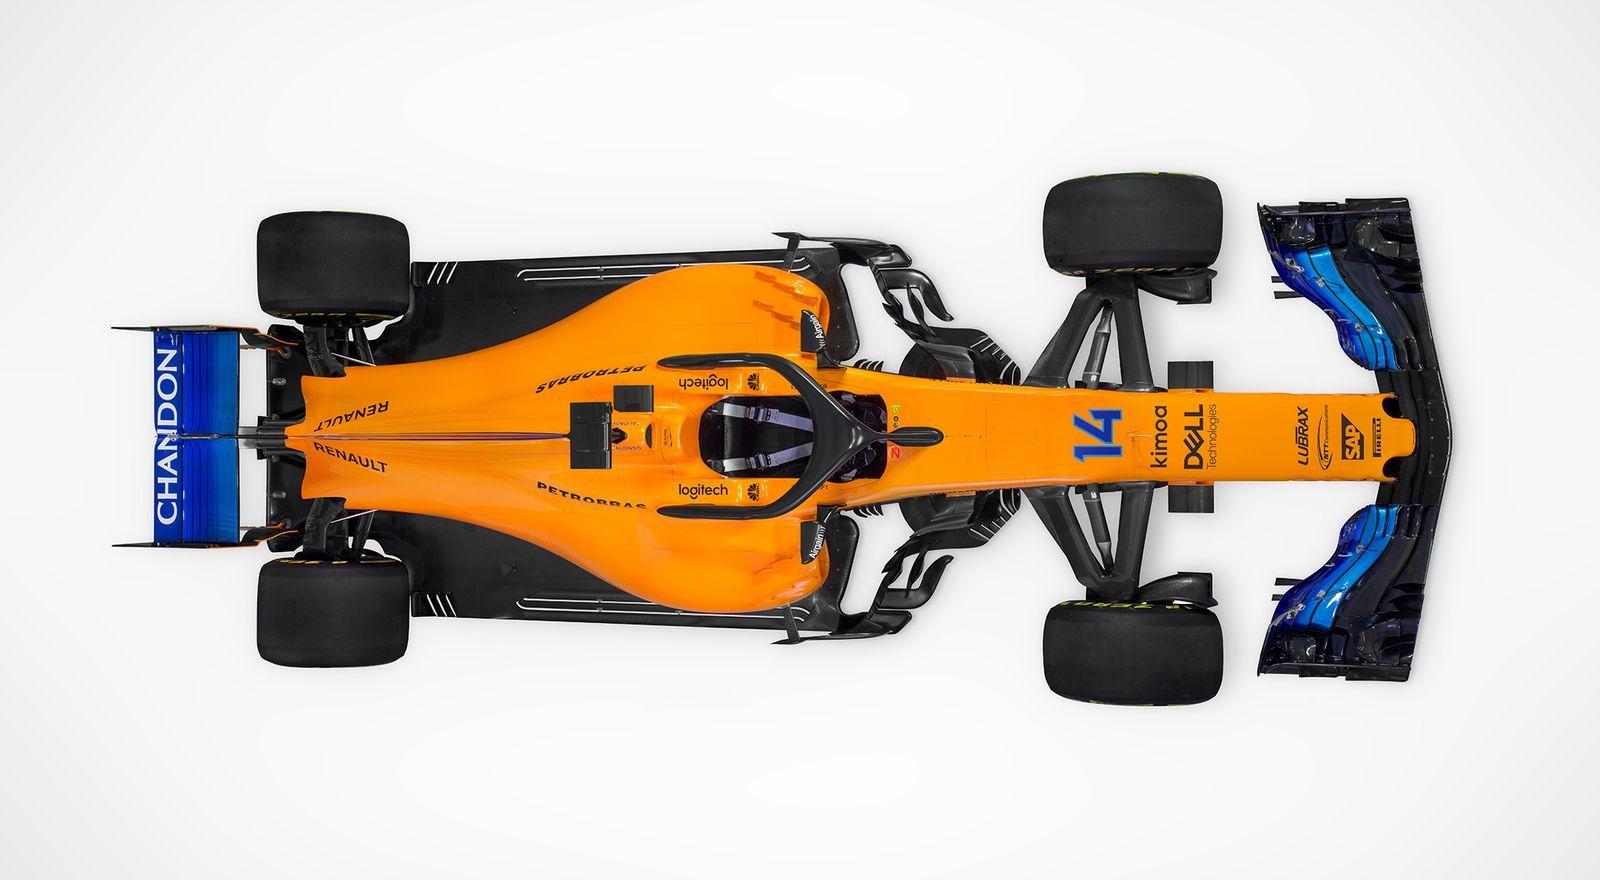 McLaren F1 Team MCL 33 - 2018 - top view